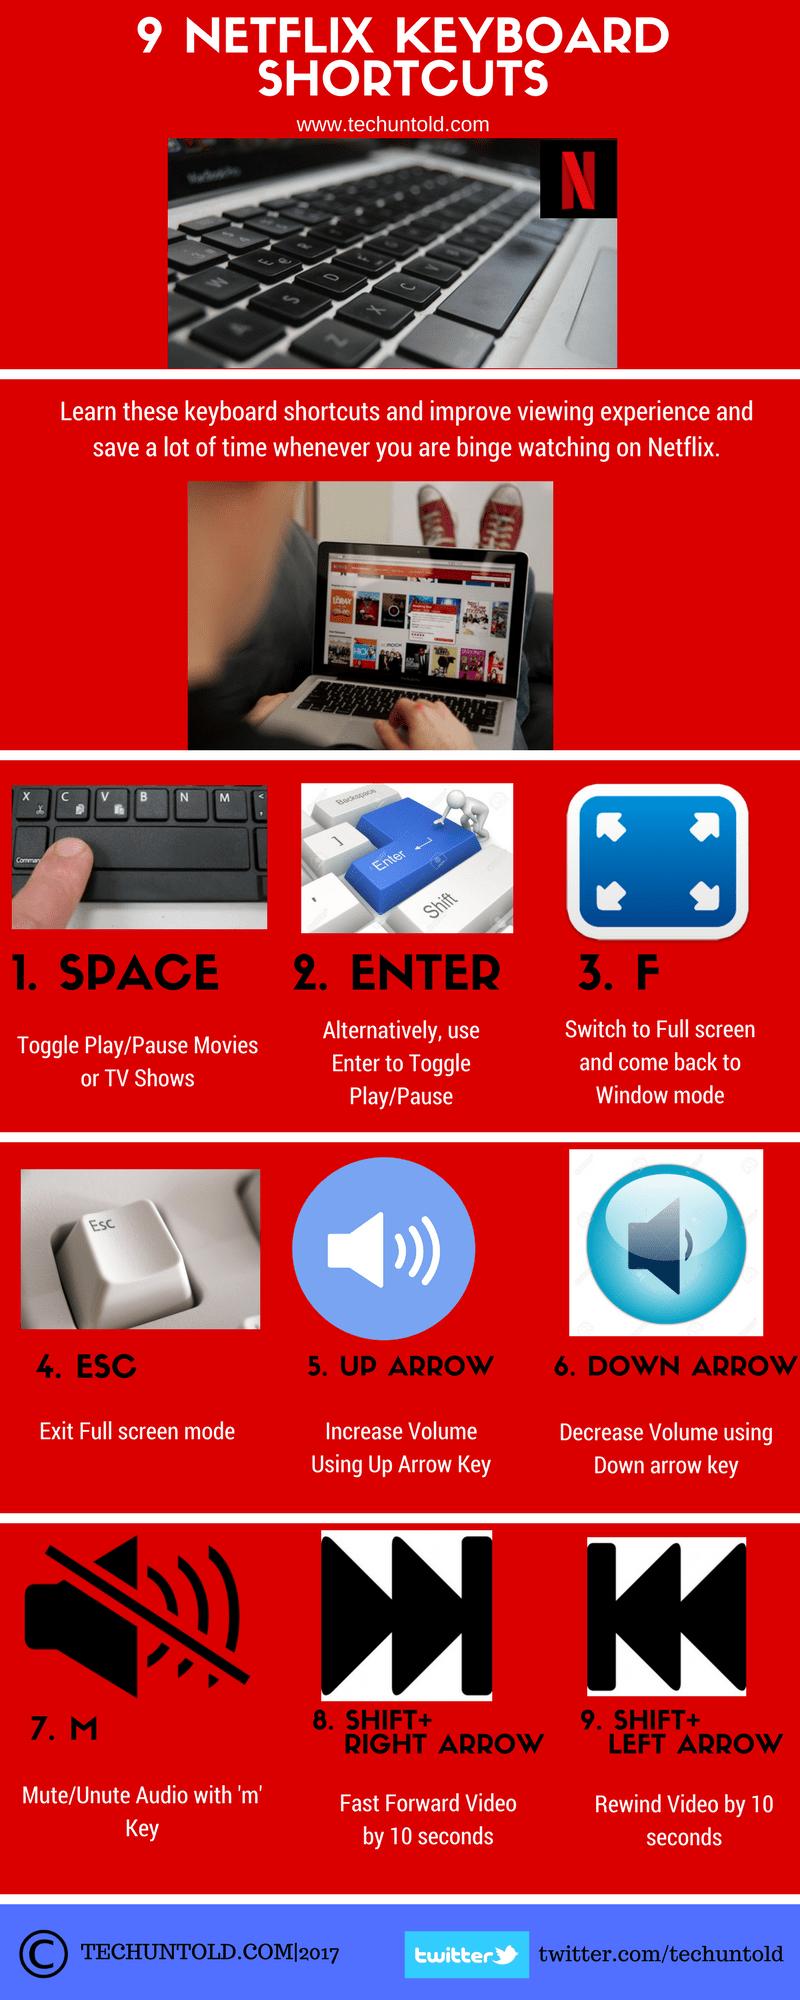 Netflix keyboard shortcuts Infographic